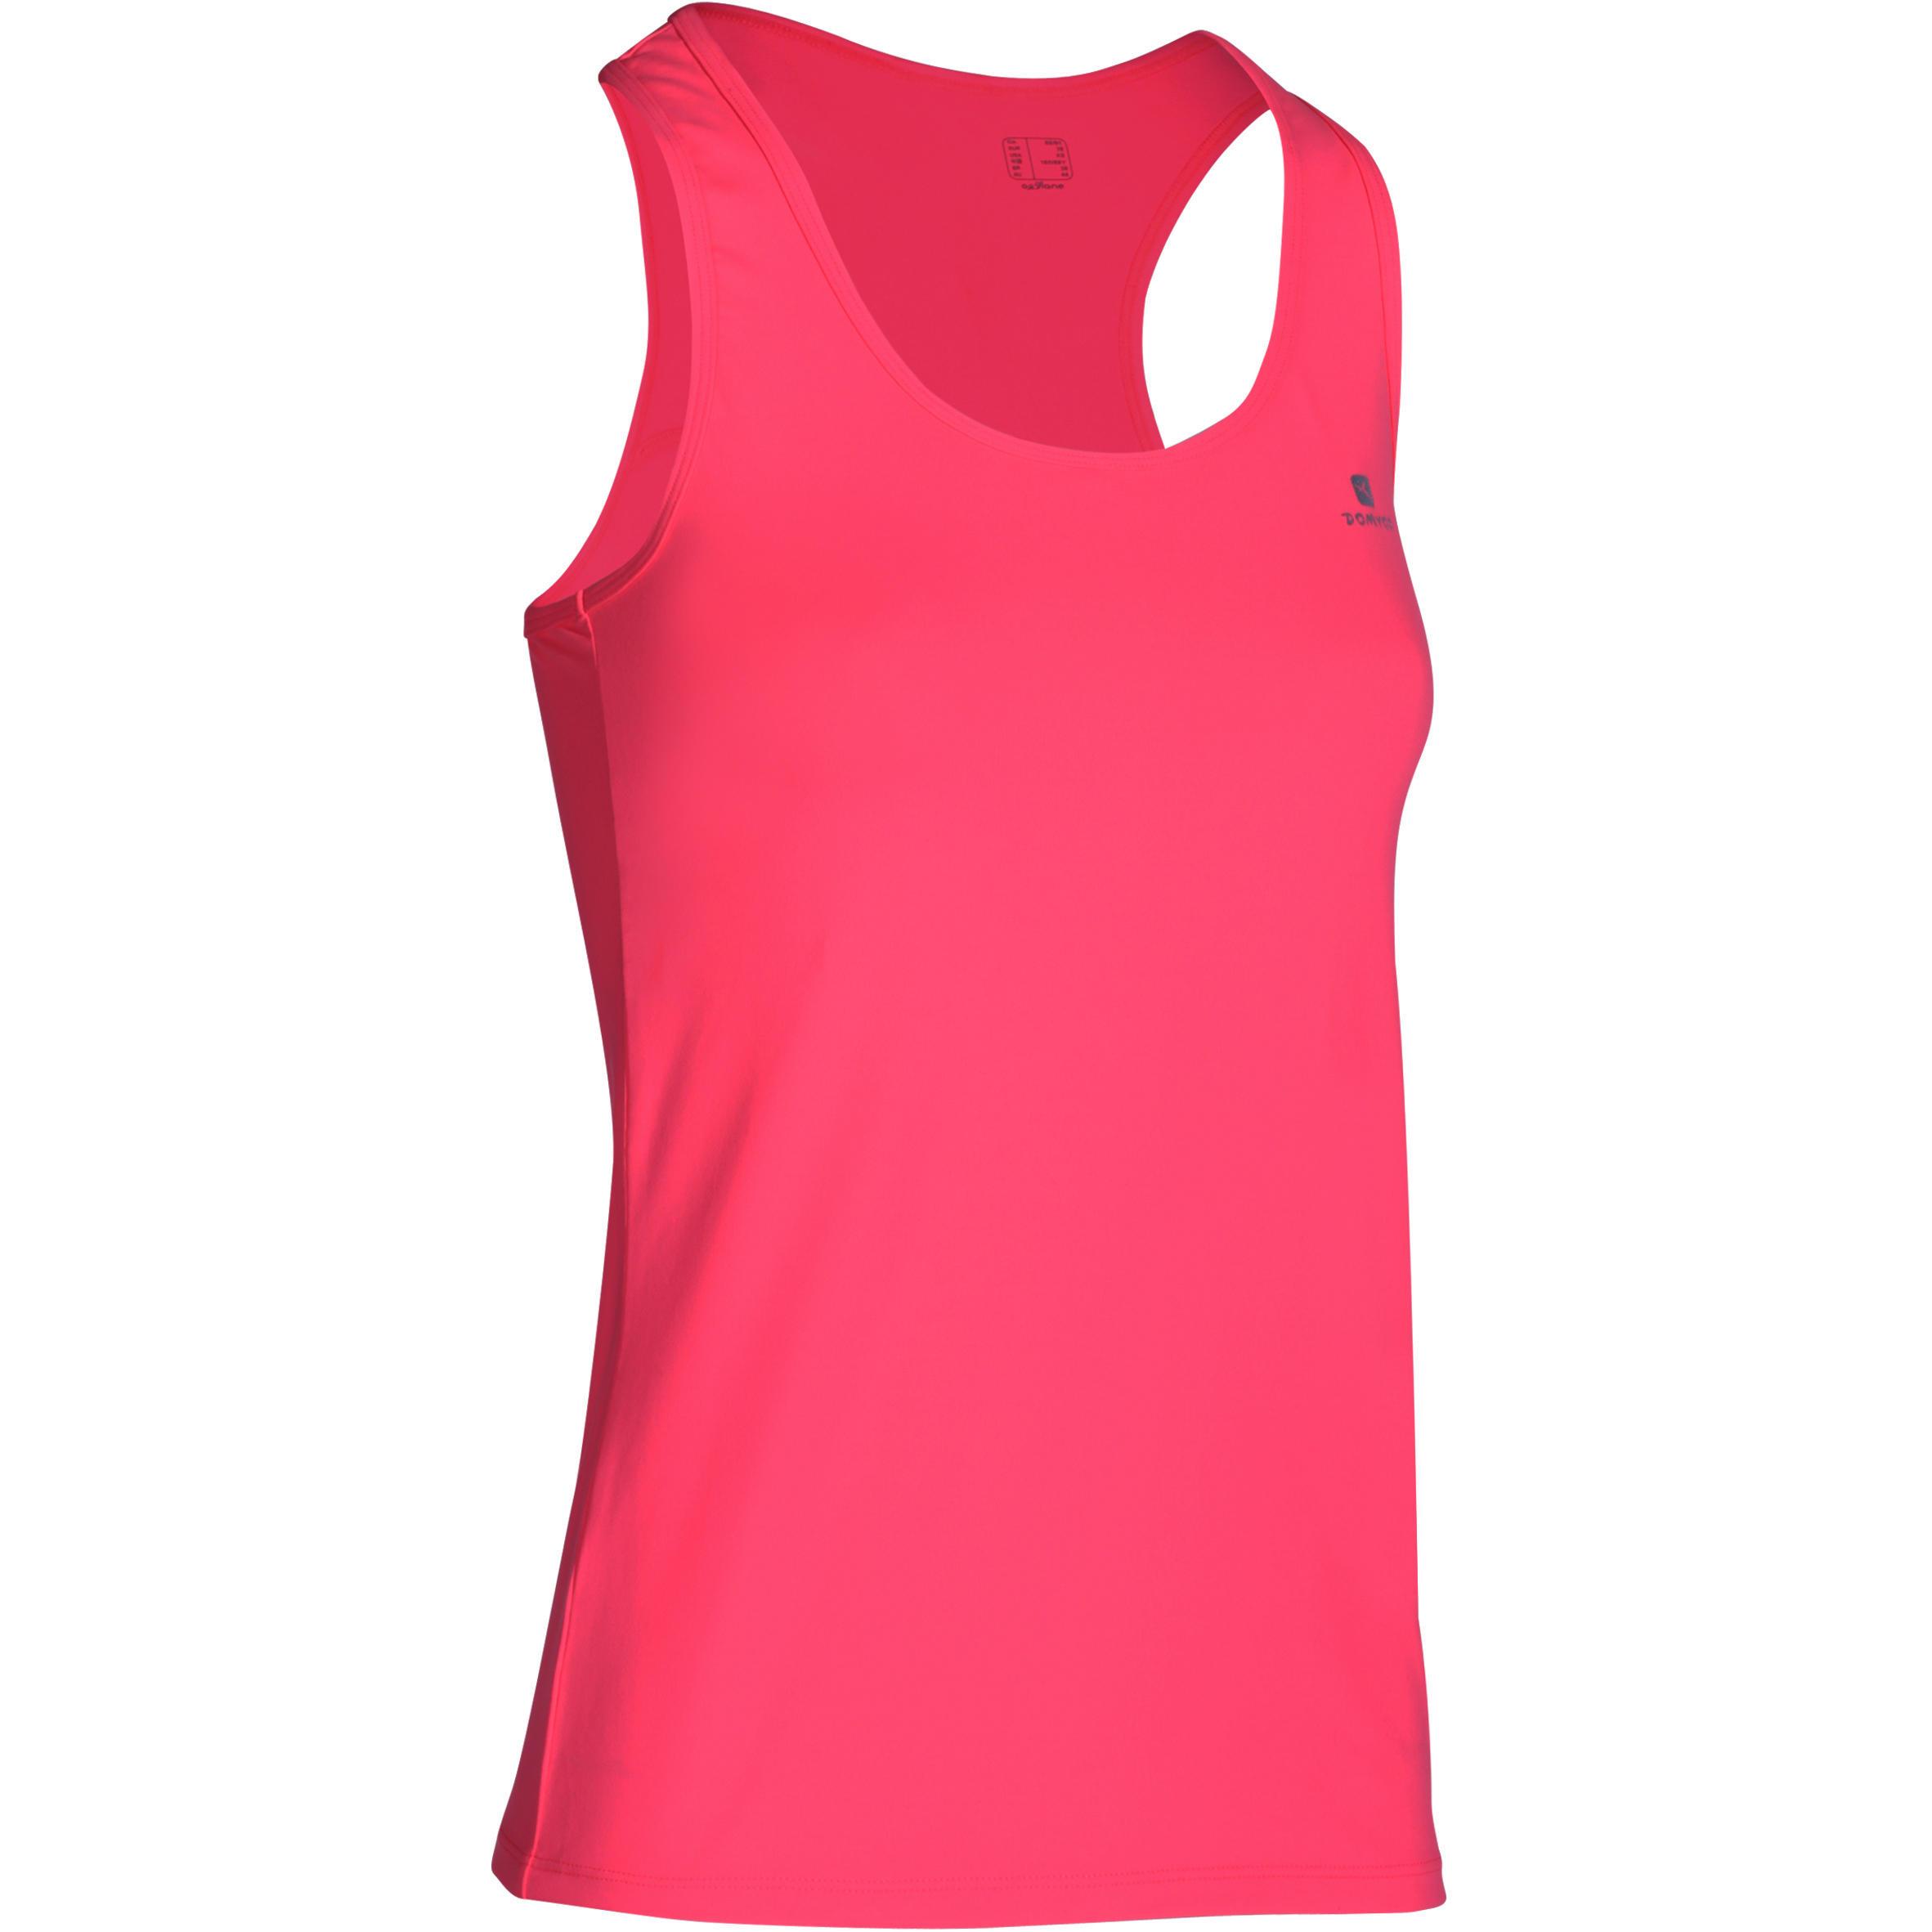 Playera sin mangas MY TOP fitness dama rosa fluorescente